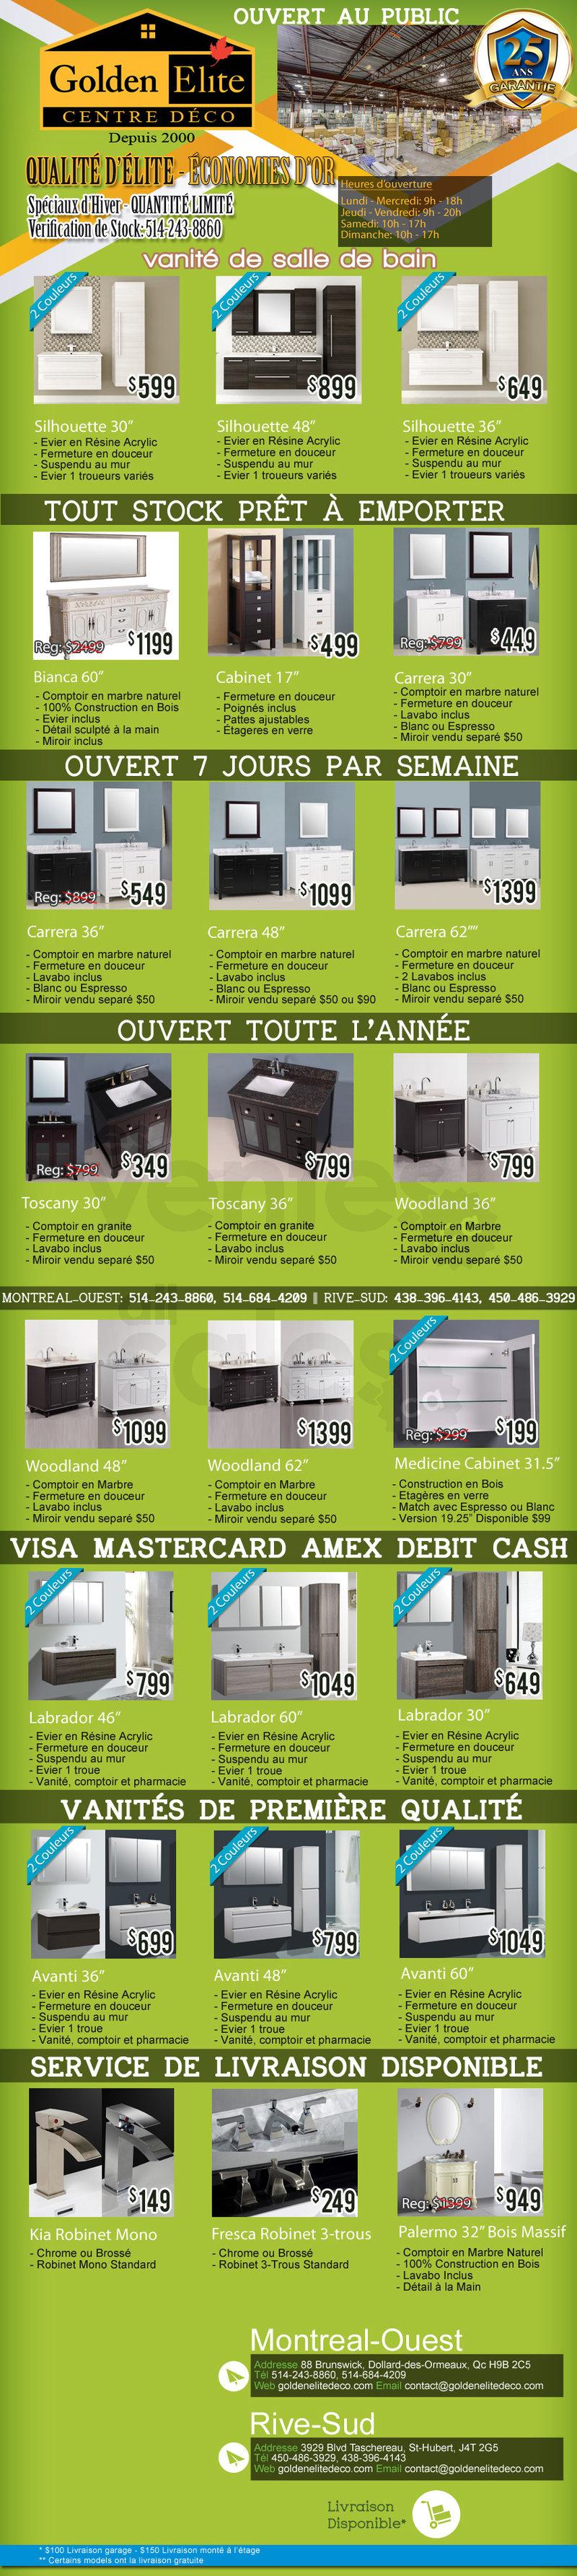 Liquidation de vanit s et de planchers for Liquidation electromenager montreal